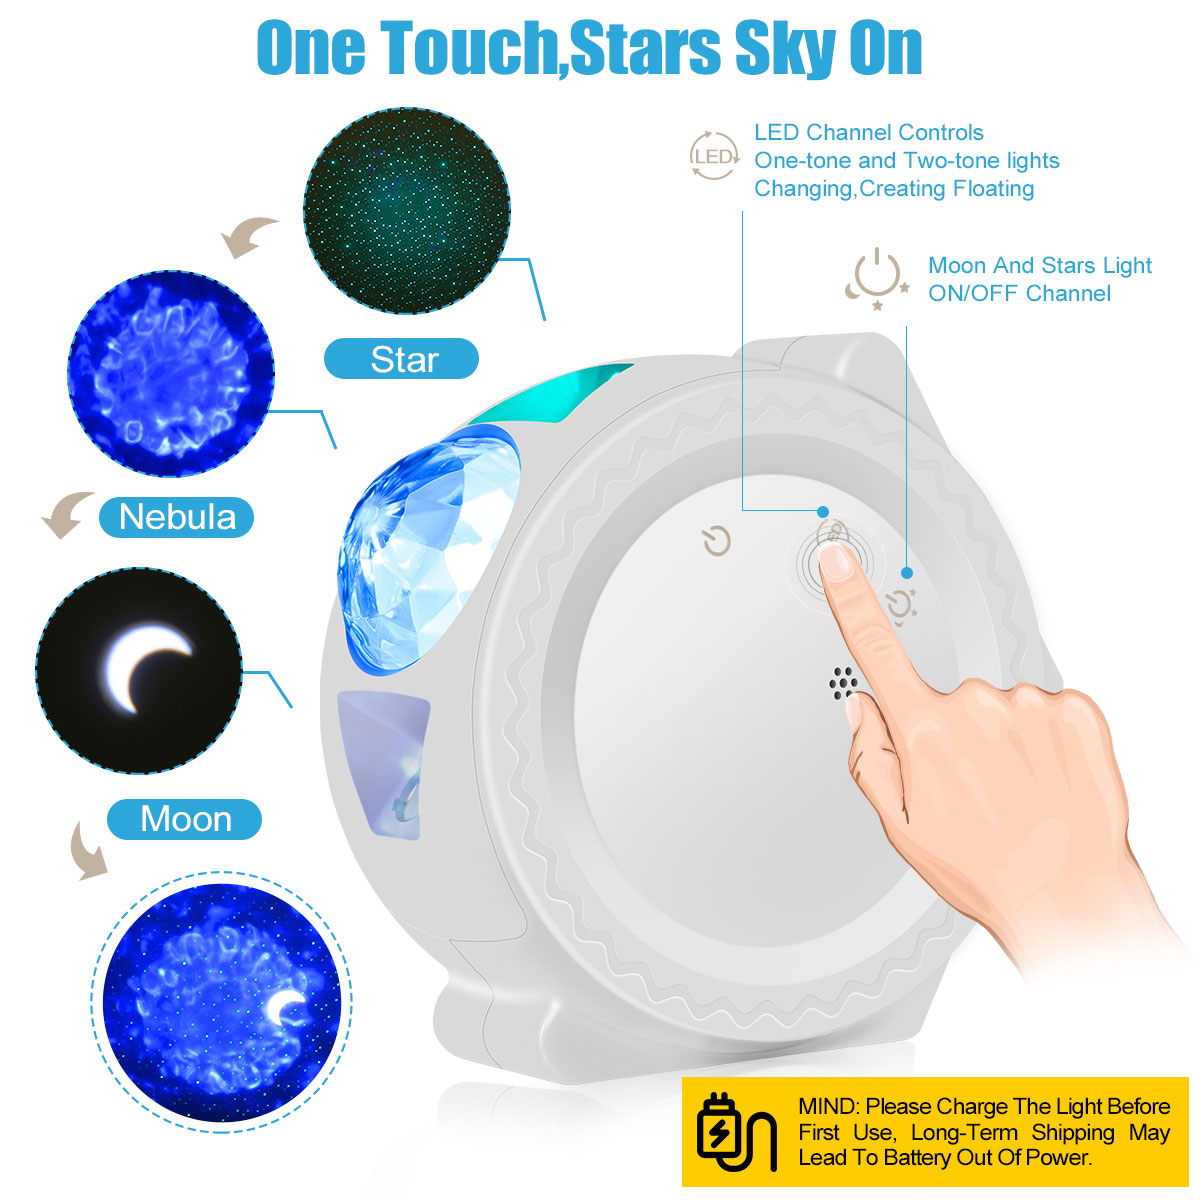 Starry Sky Projector Night Lamp - Beyond Baby Talk